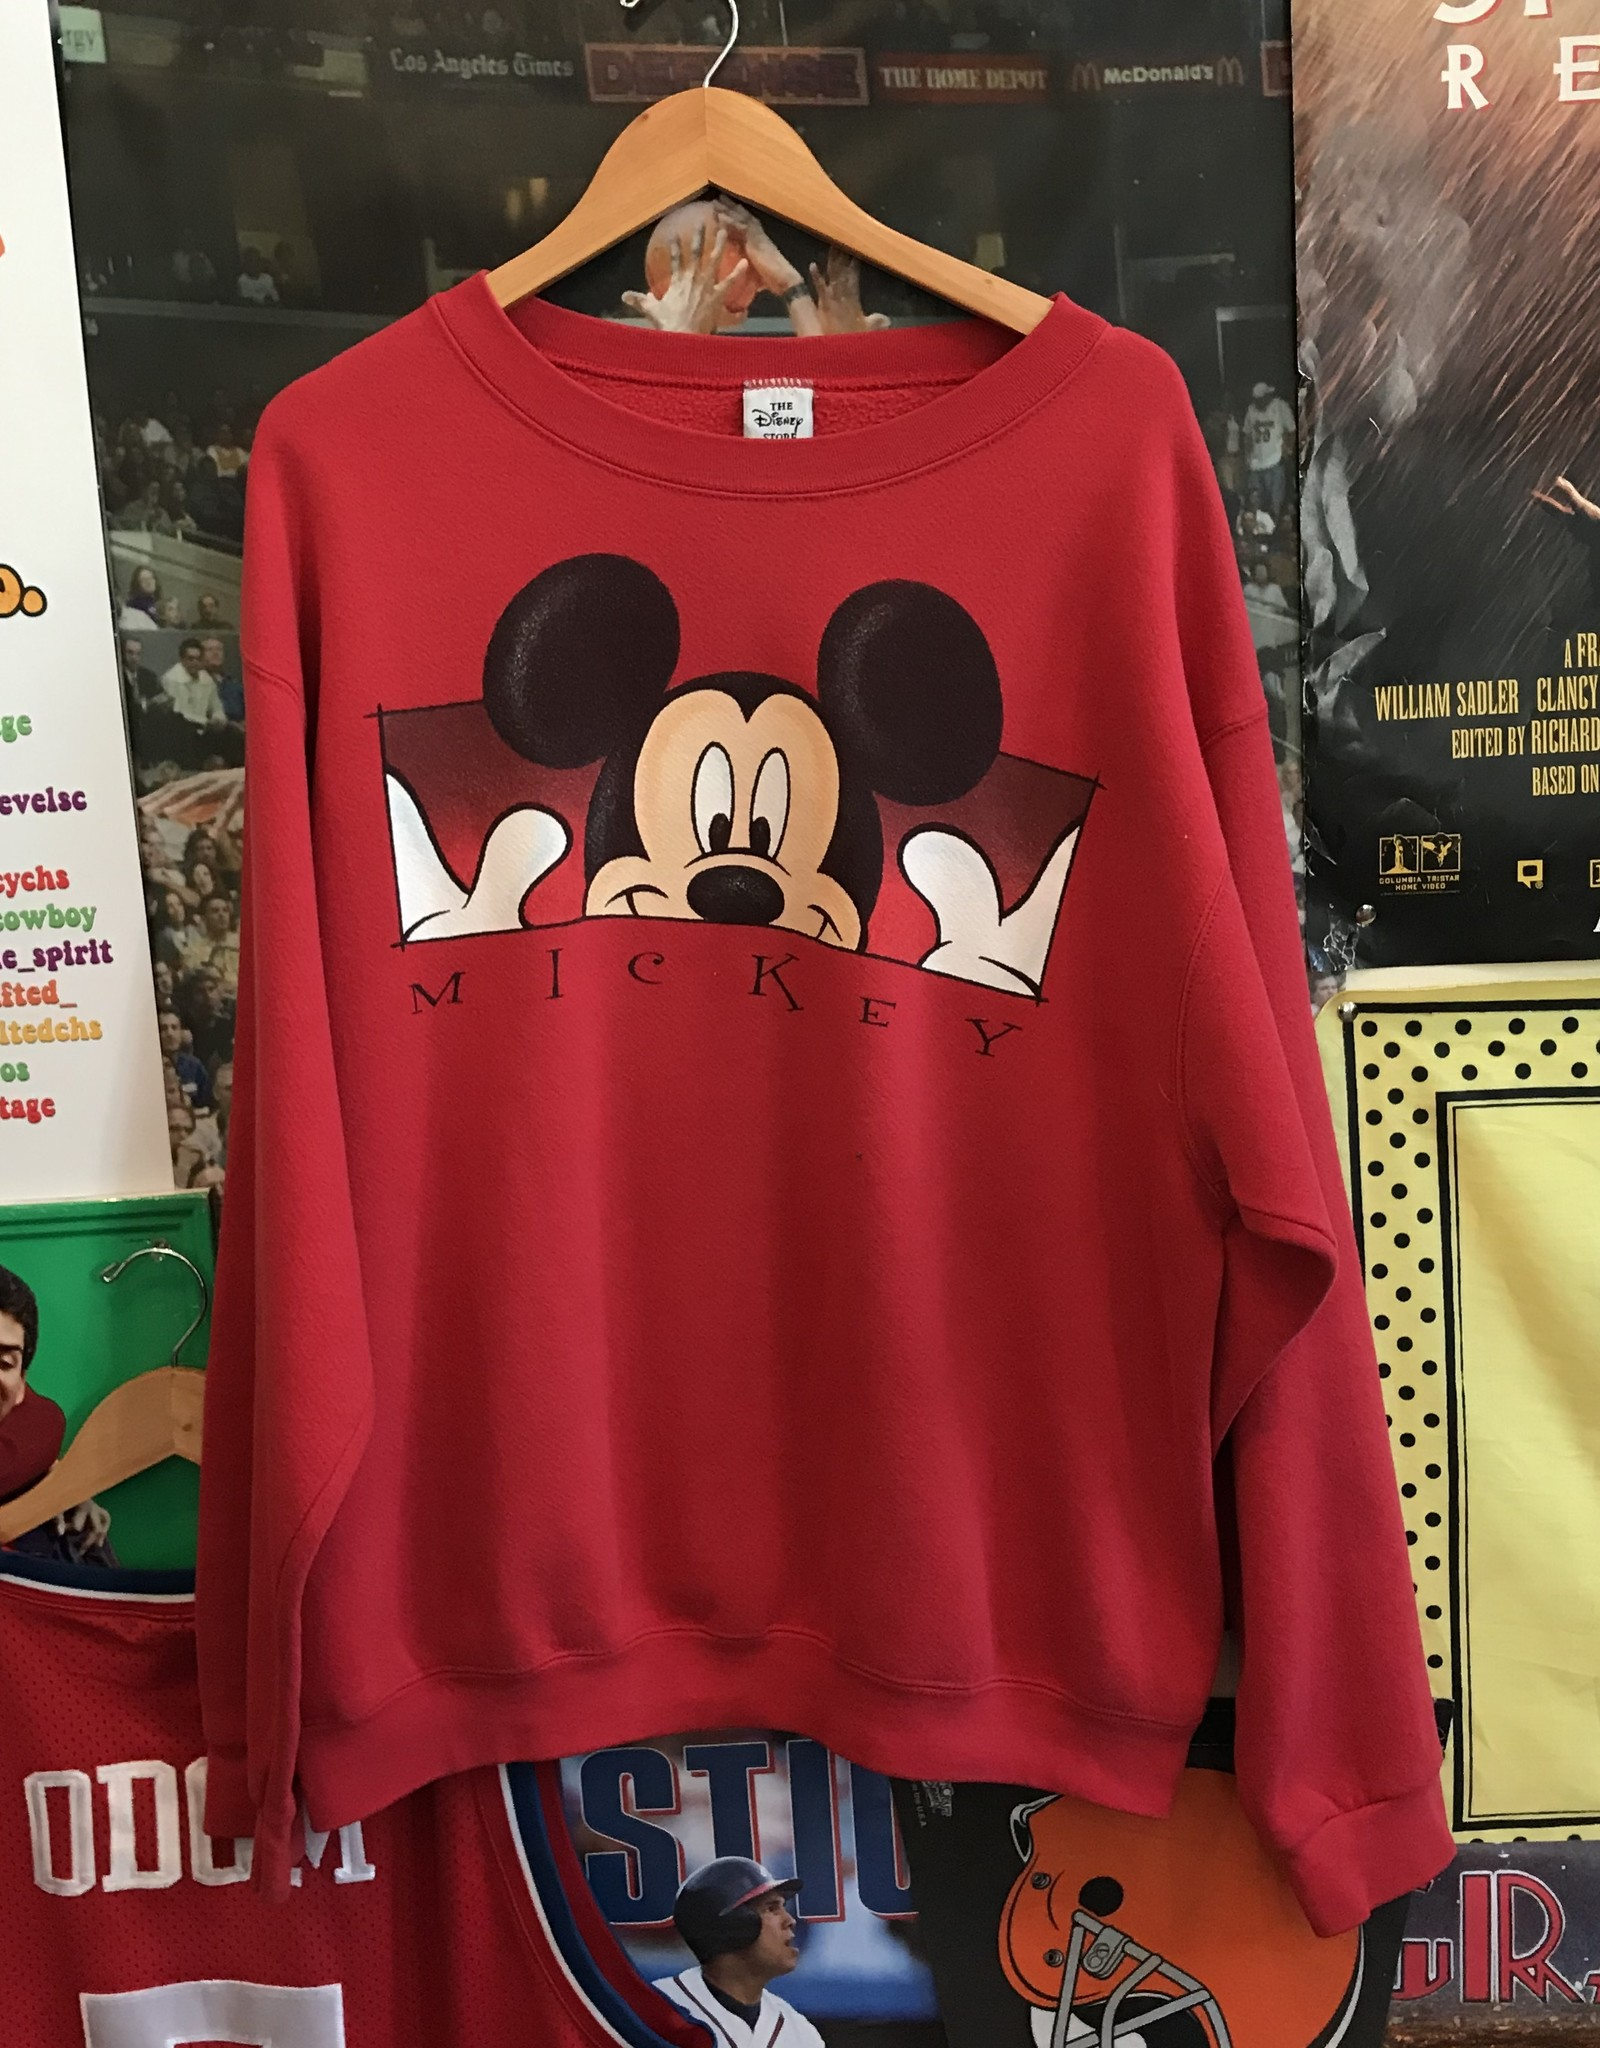 3569mickey mouse red crewneck sz. XL